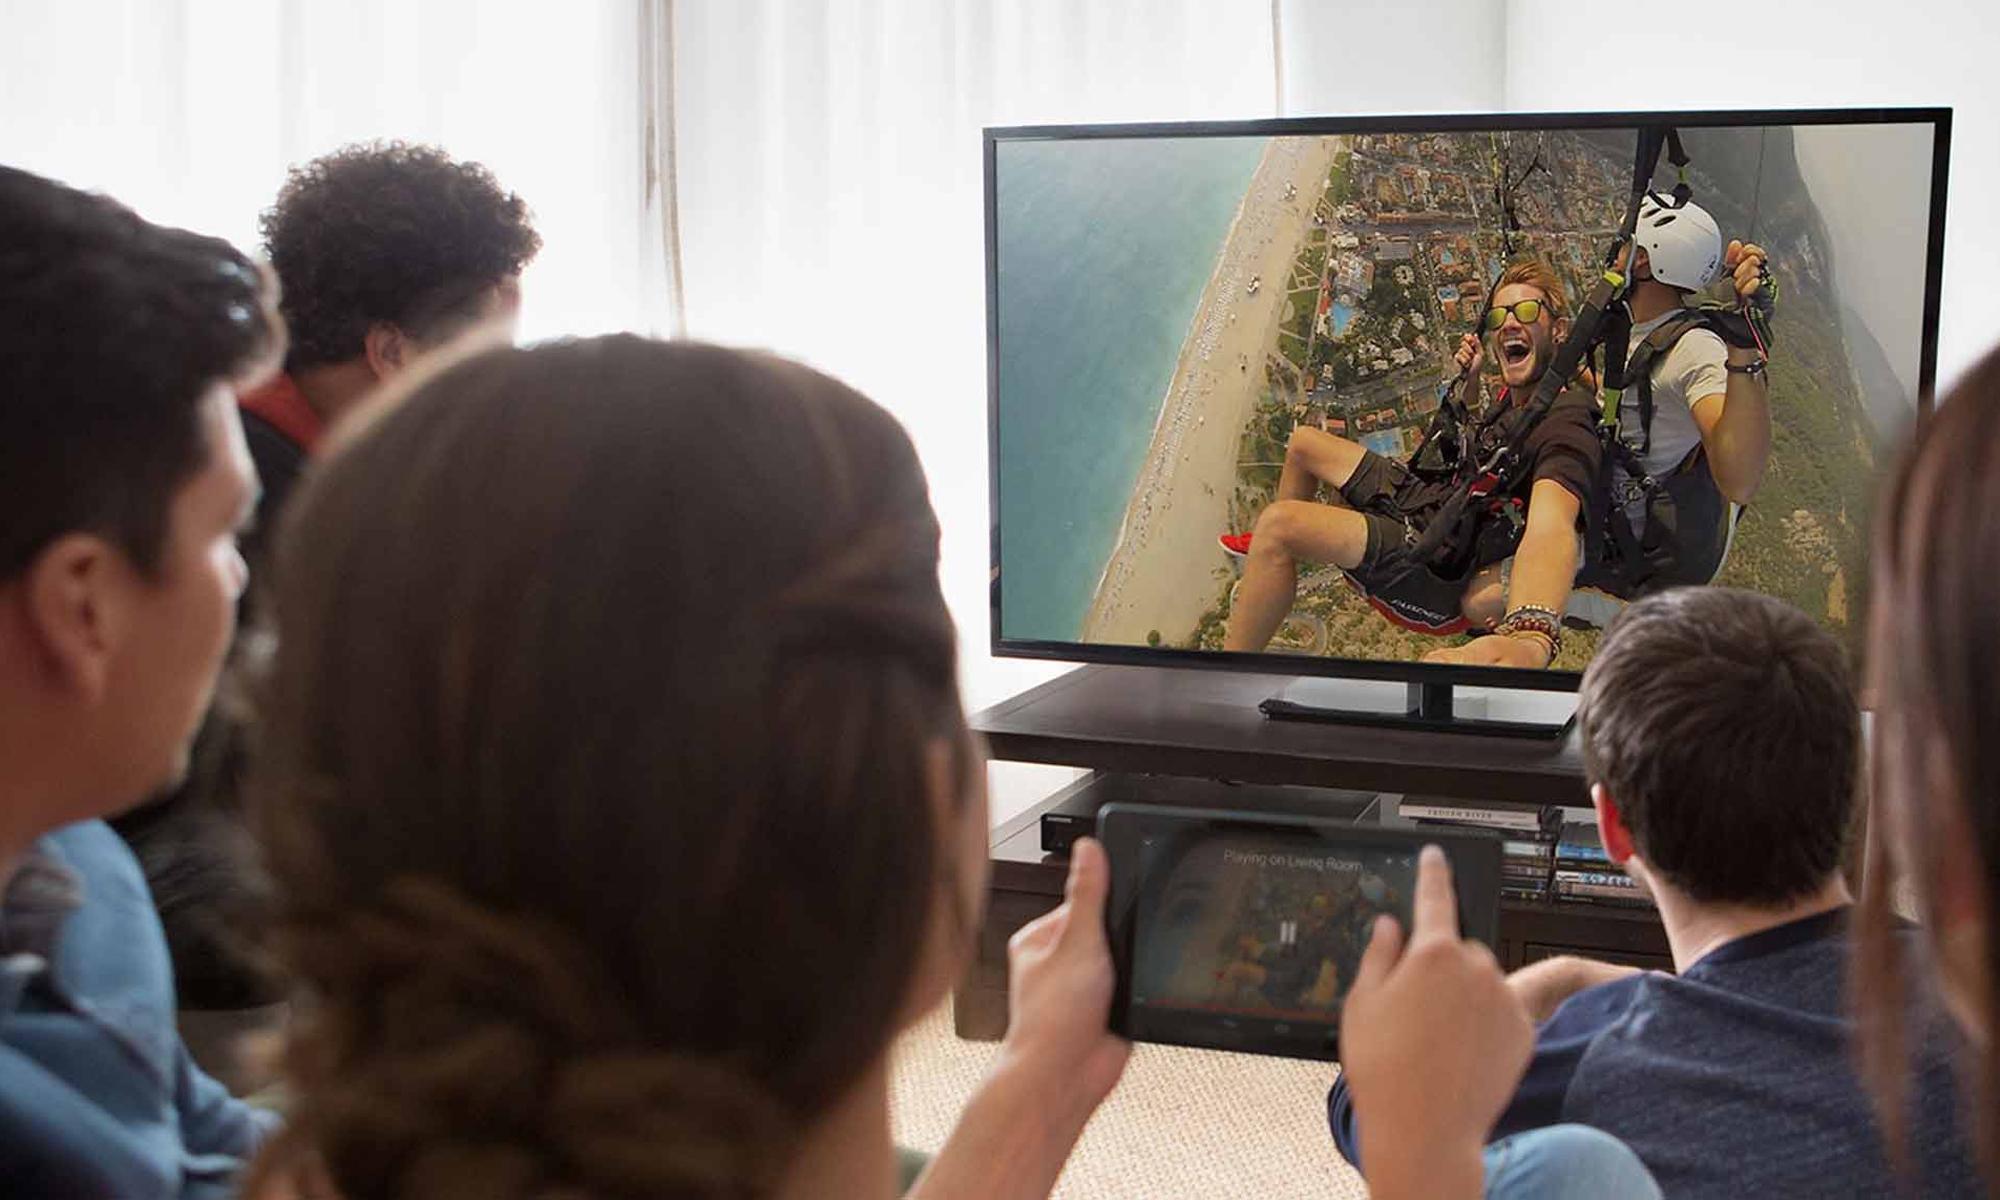 Best Miracast Dongle 2019 - Wireless Screen-Mirroring